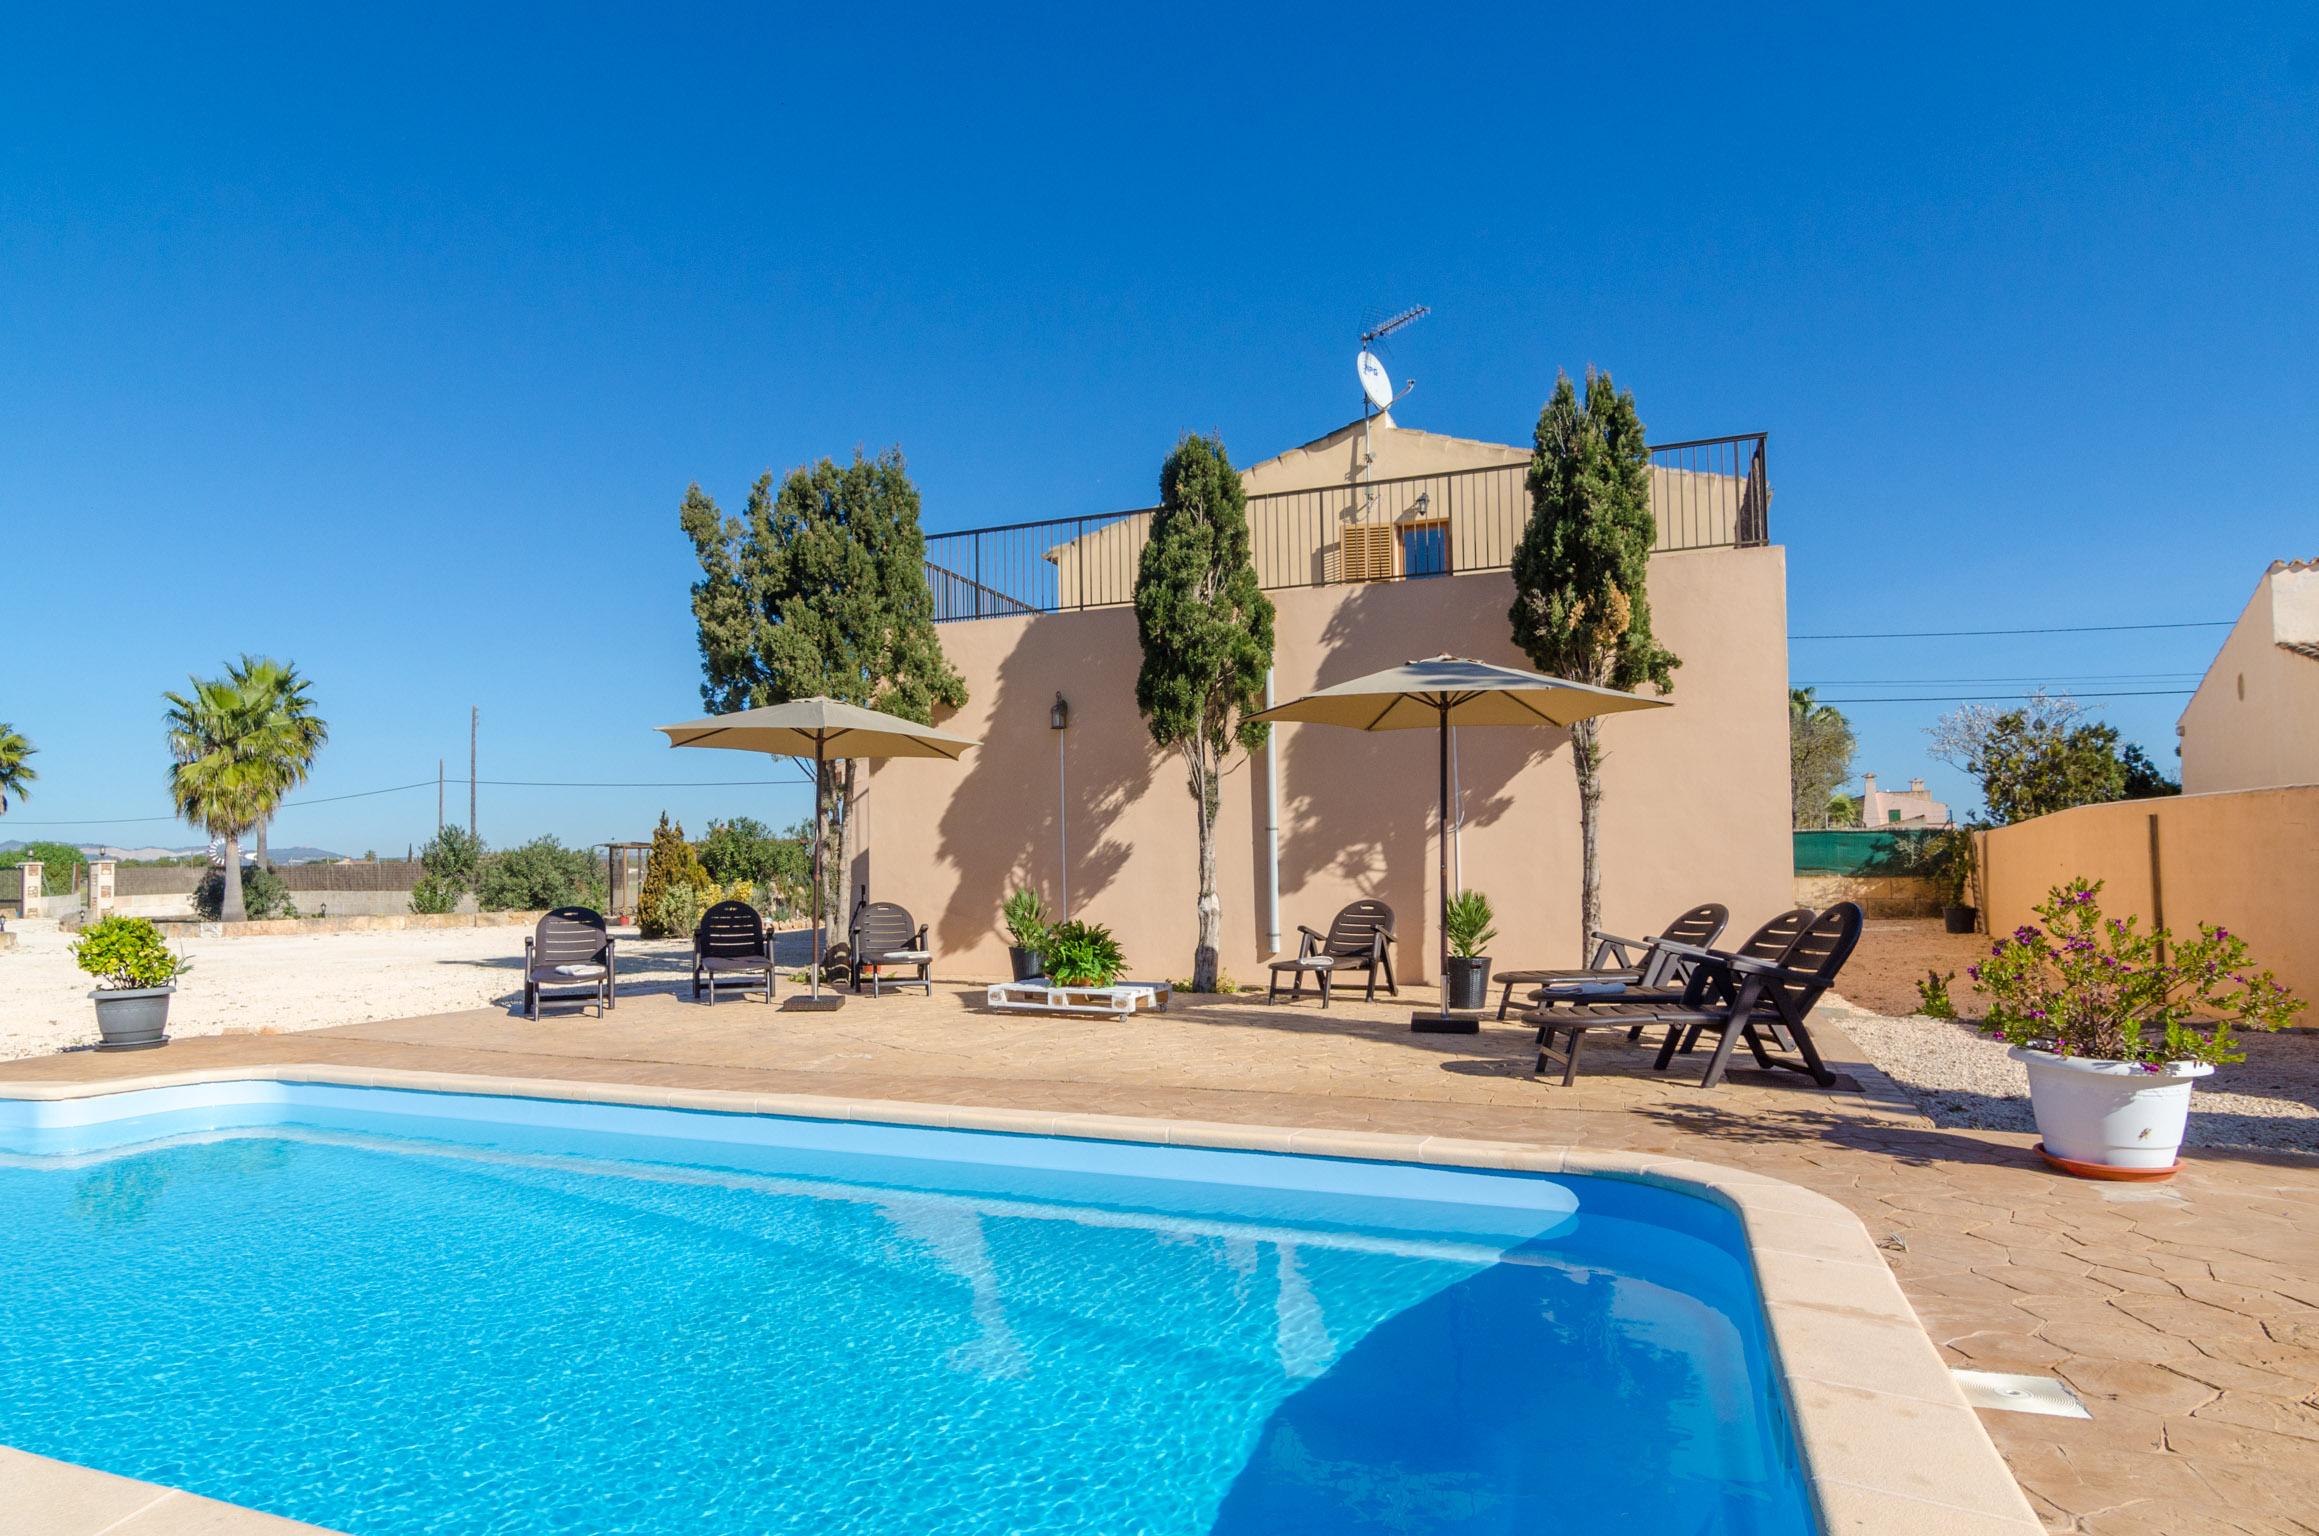 Ferienhaus SANT BLAI VELL (2284789), Campos, Mallorca, Balearische Inseln, Spanien, Bild 2